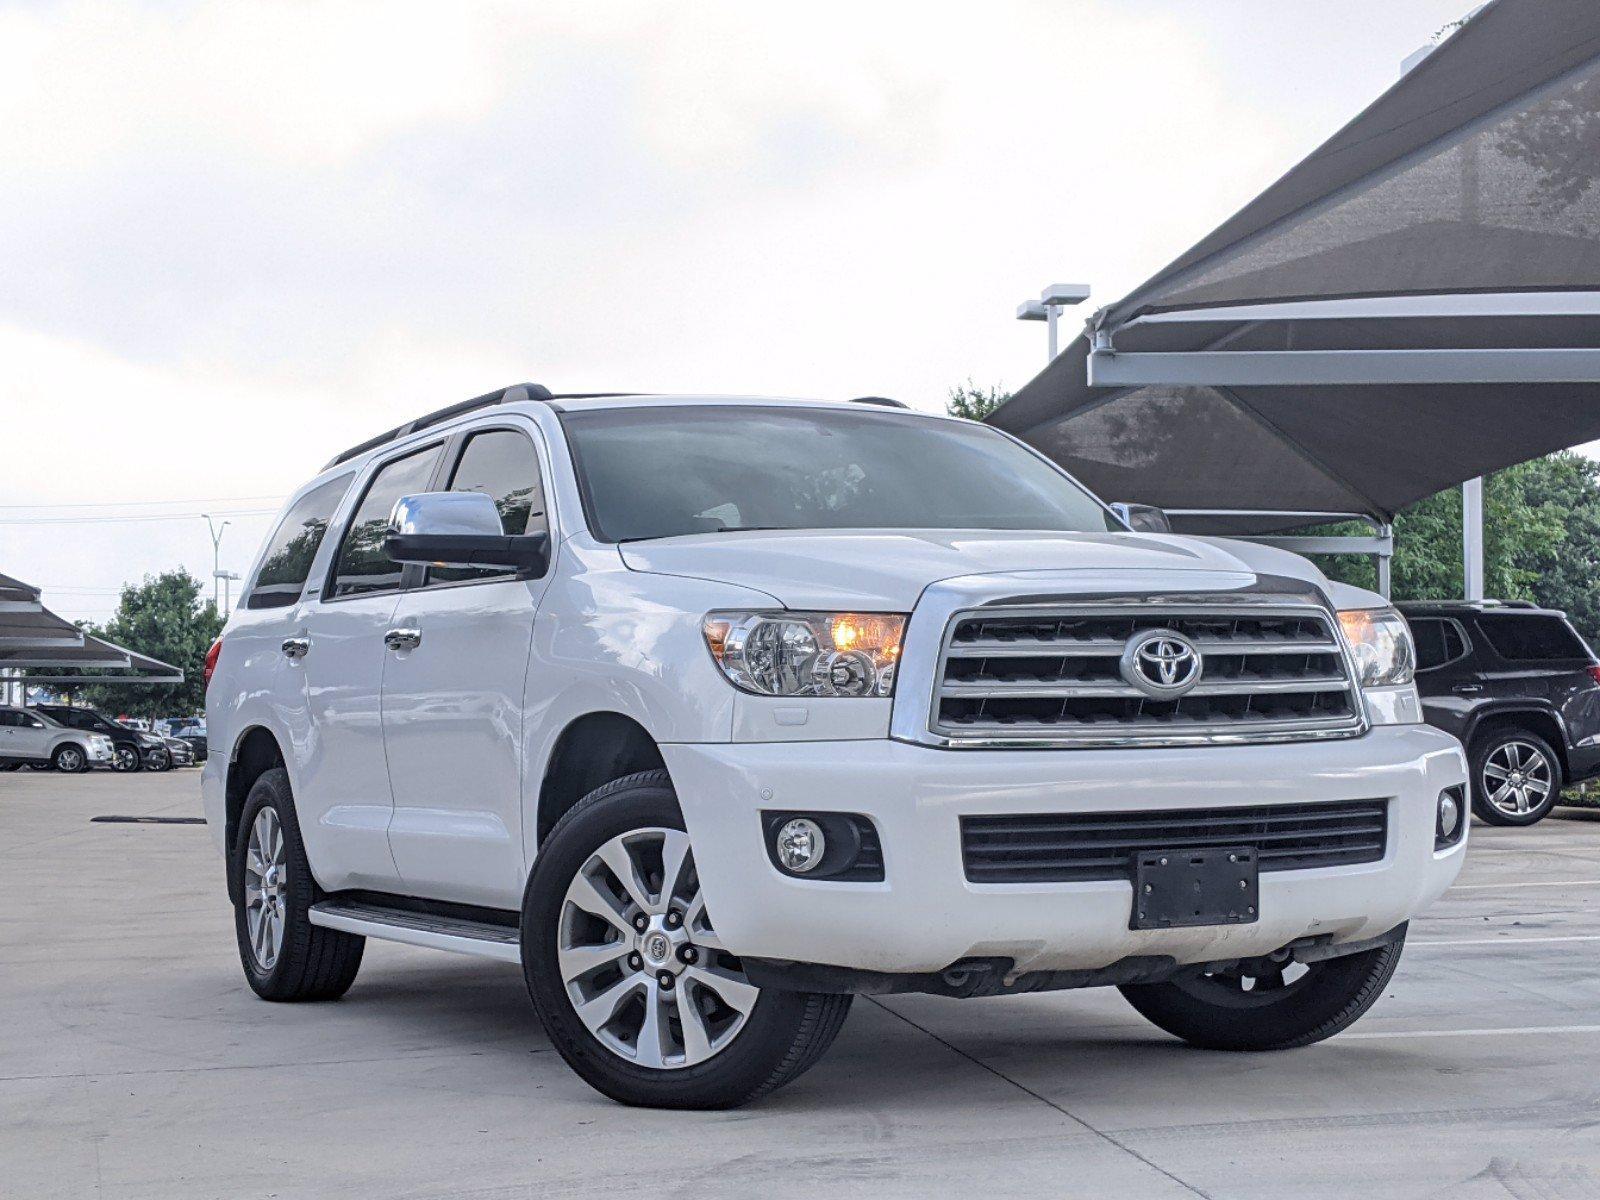 2016 Toyota Sequoia Vehicle Photo in Selma, TX 78154